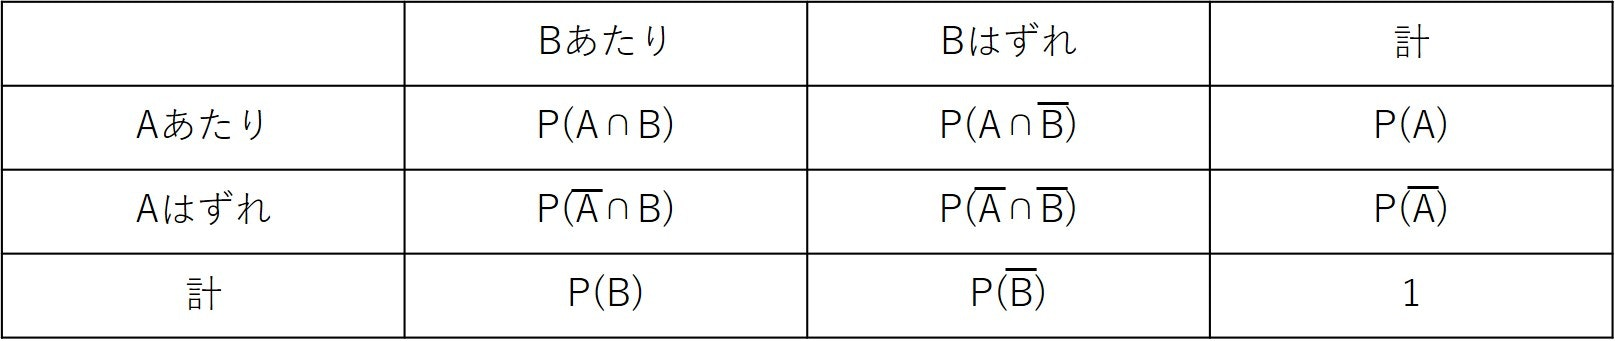 条件付き確率1.jpg